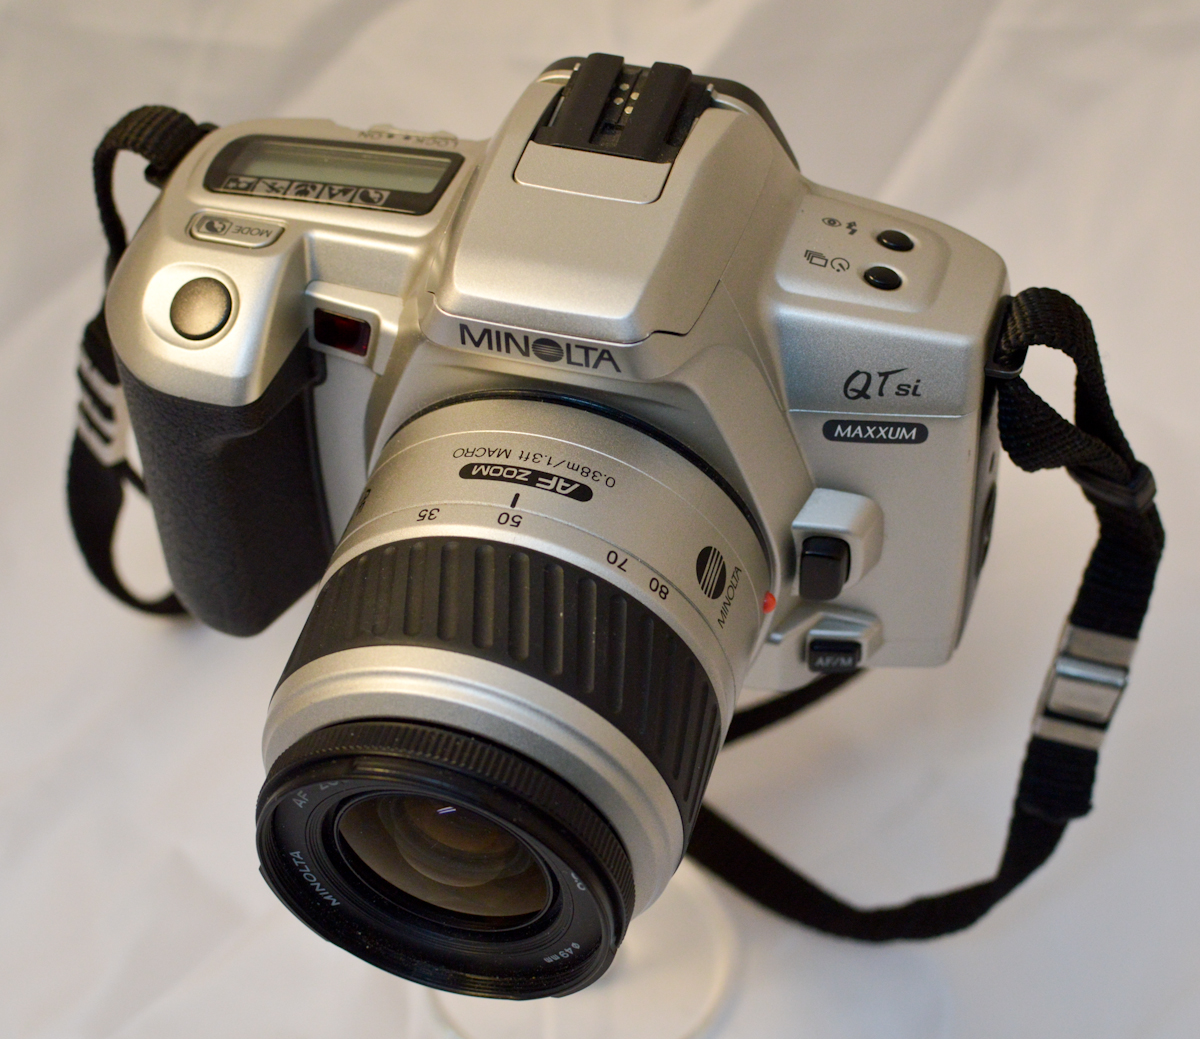 Random Camera Blog A P Amp S Slr The Minolta Maxxum Qtsi border=